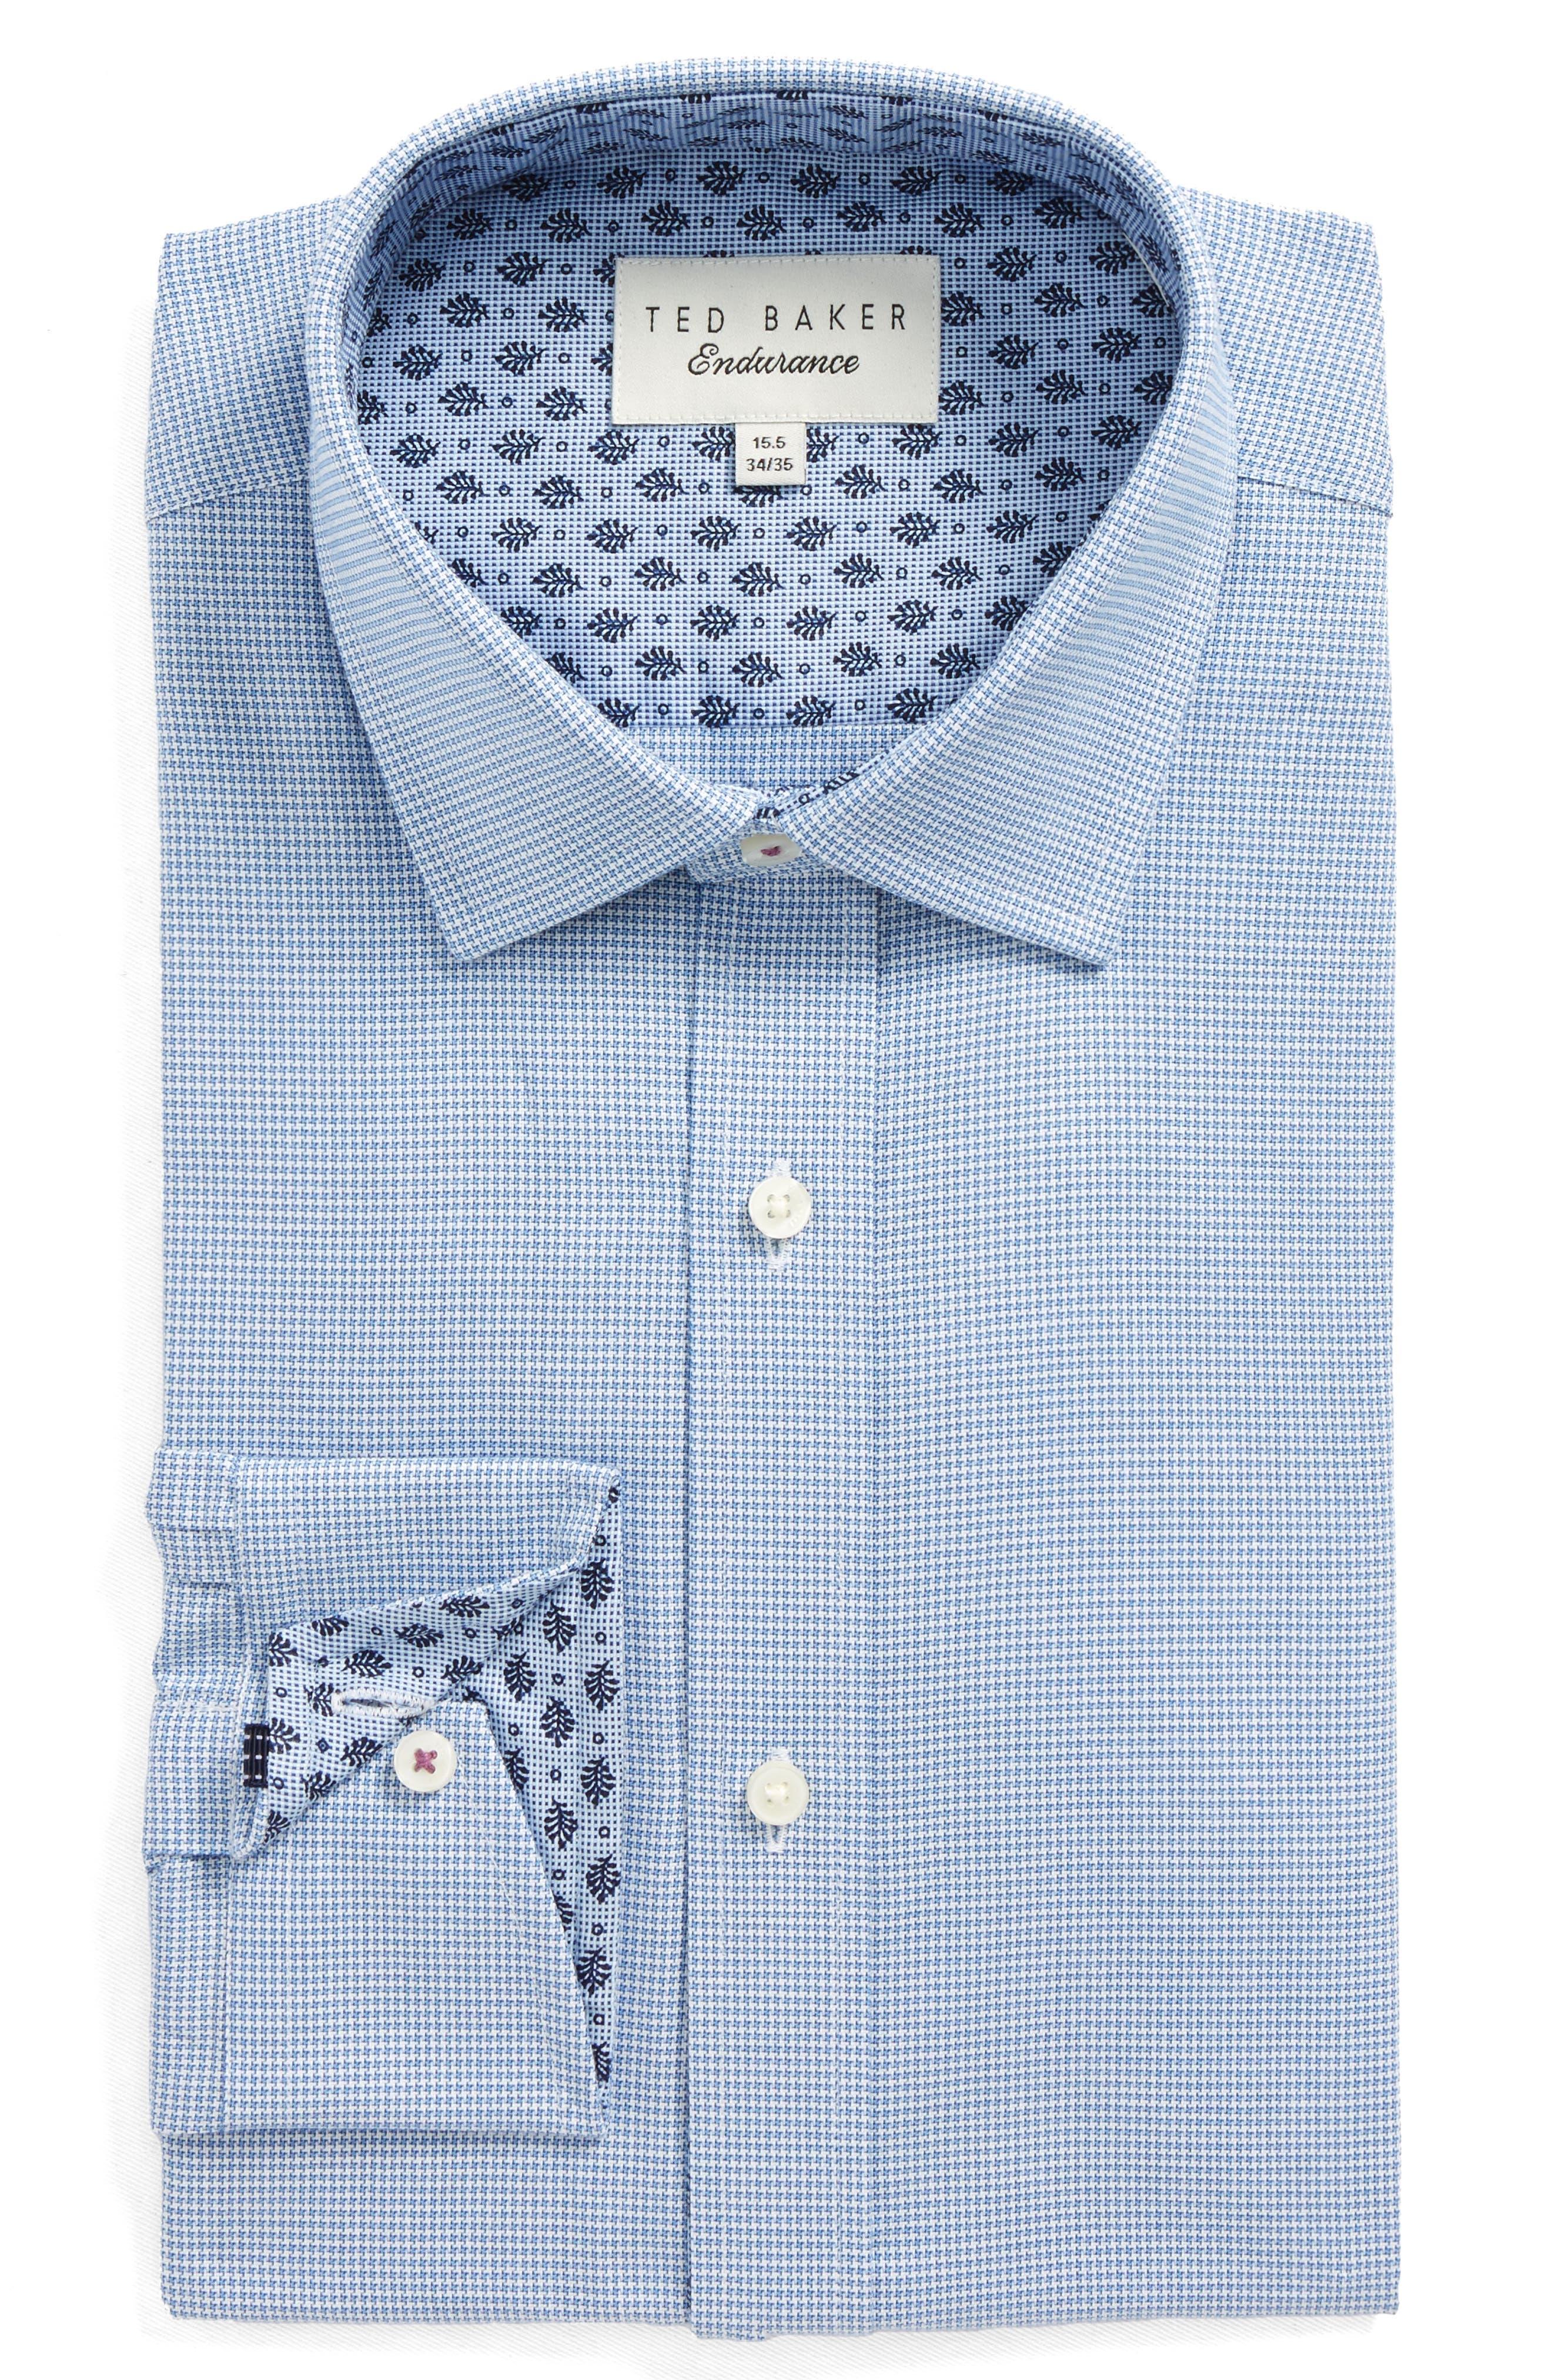 Endurance Renton Trim Fit Dress Shirt,                             Main thumbnail 1, color,                             BLUE